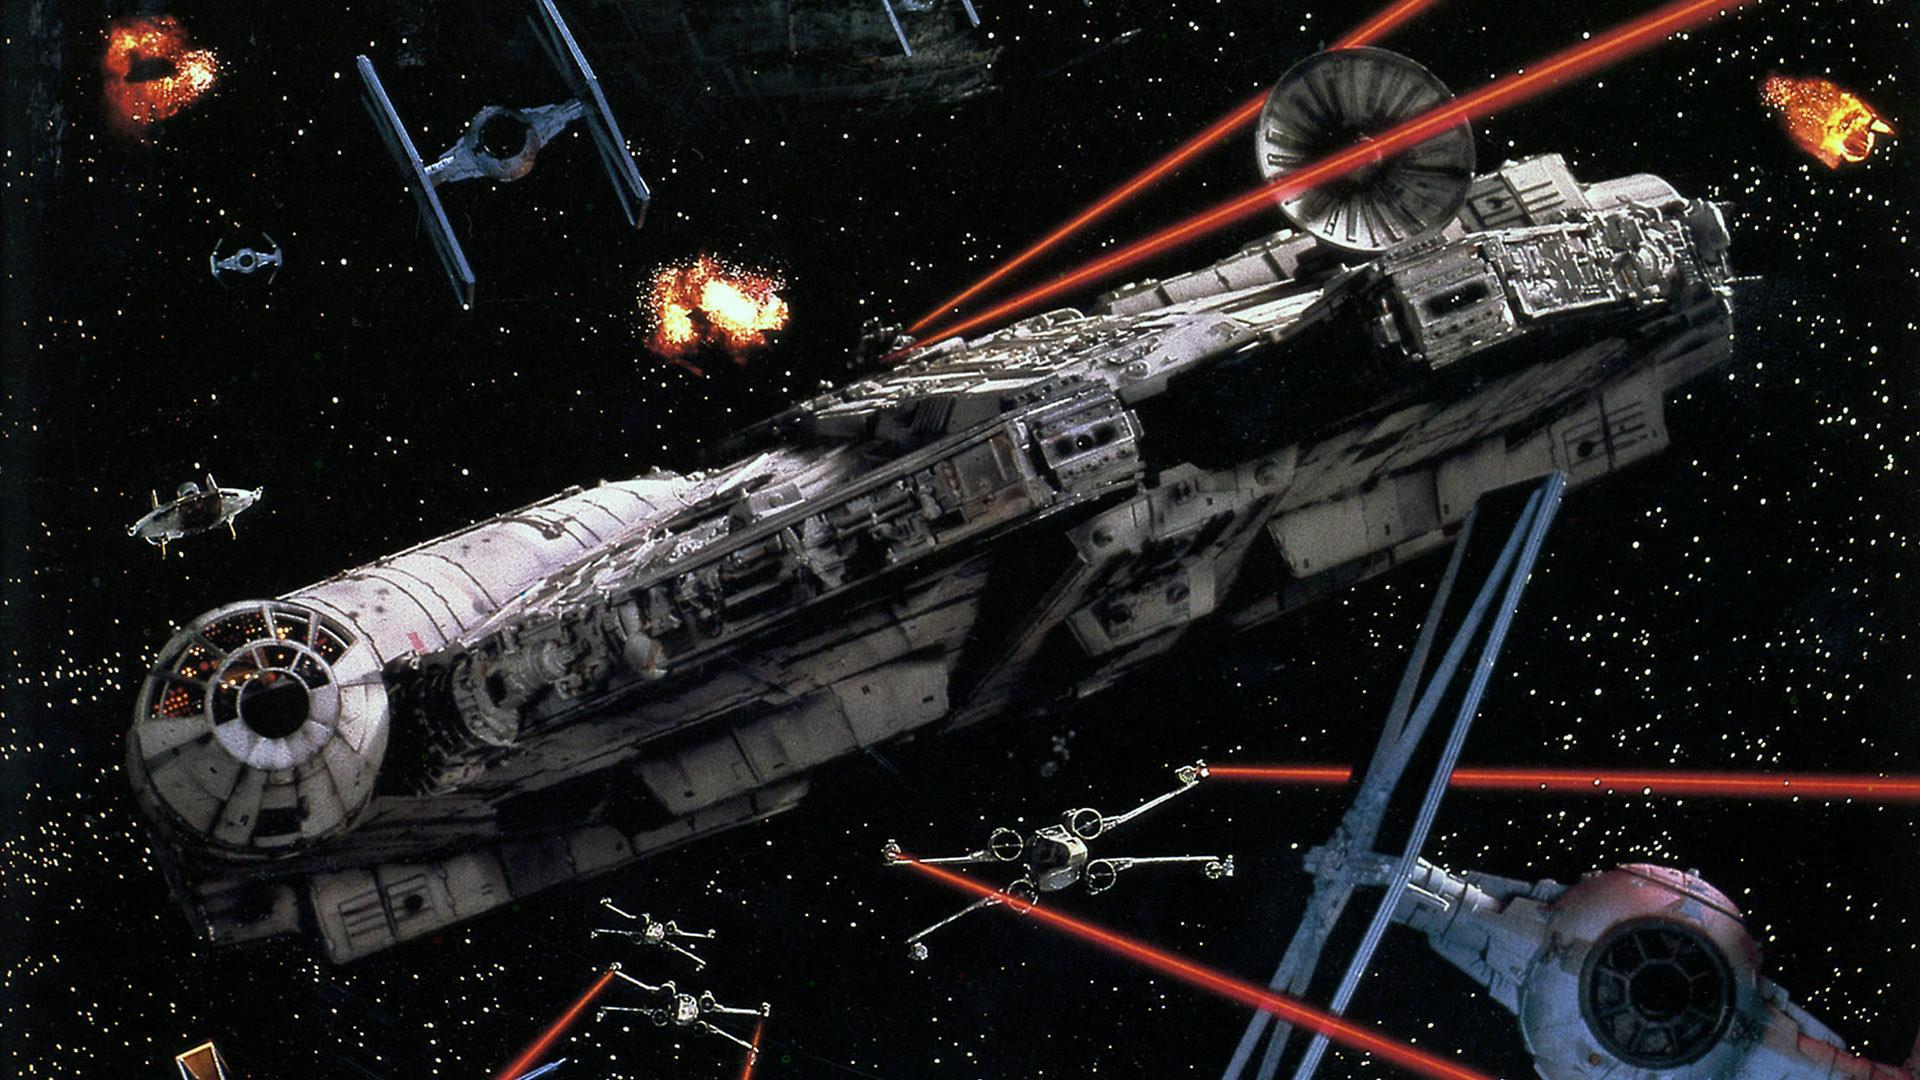 Free Download High Resolution Star Wars Ships Wallpaper Widescreen